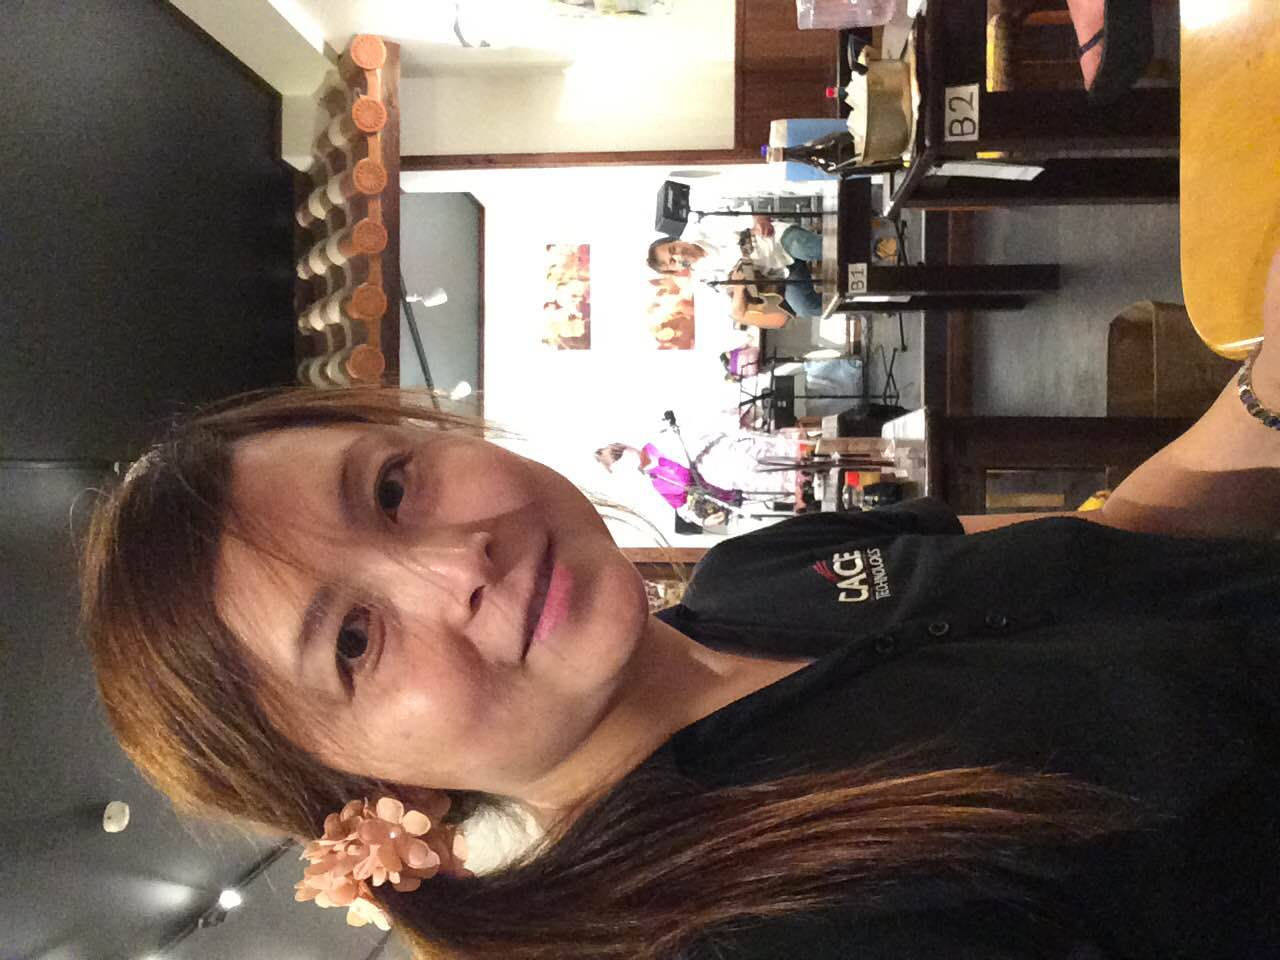 1/2015111620001506-IMG_0248-small.jpg